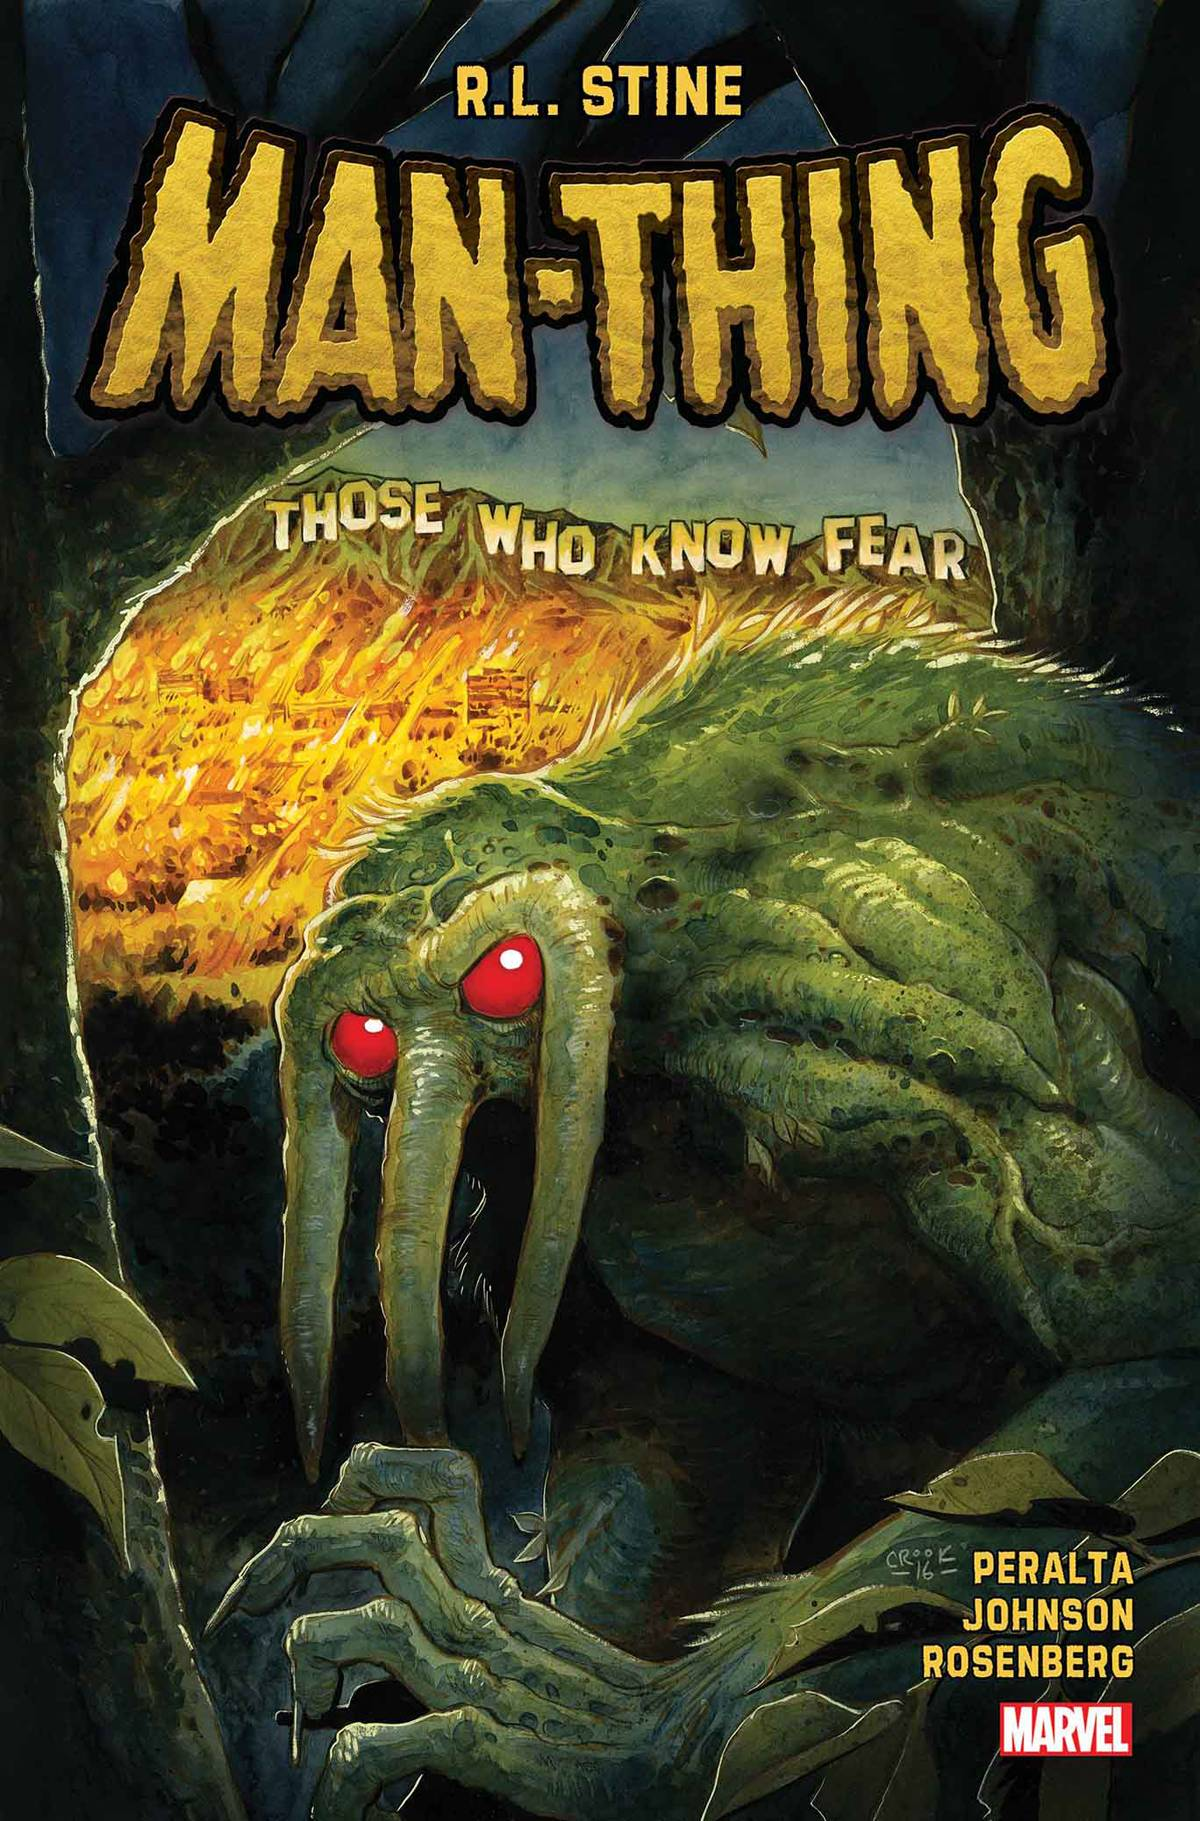 Man-Thing (5-issue mini-series)